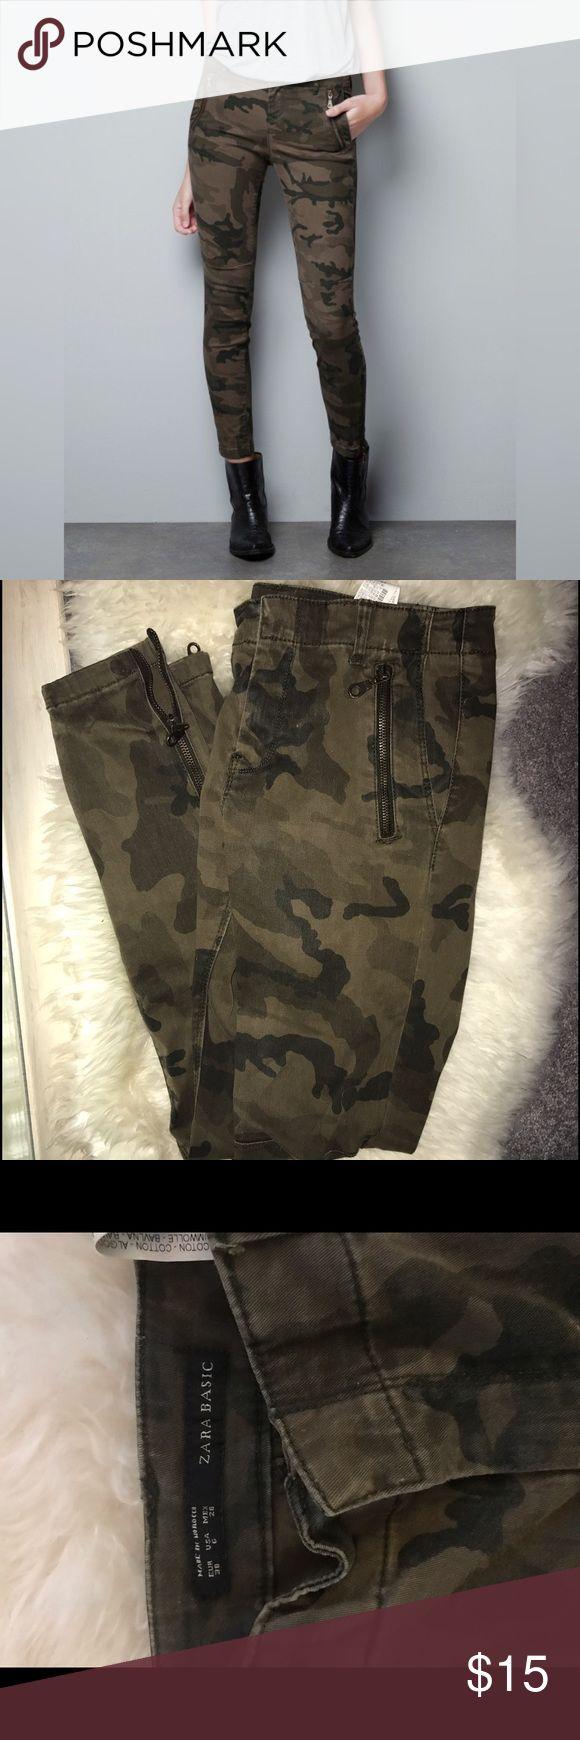 Zara Camouflage Skinny Pants Cute Skinnies from Zara. Hit and trendy in good condition. Size US 6. Zara Pants Skinny